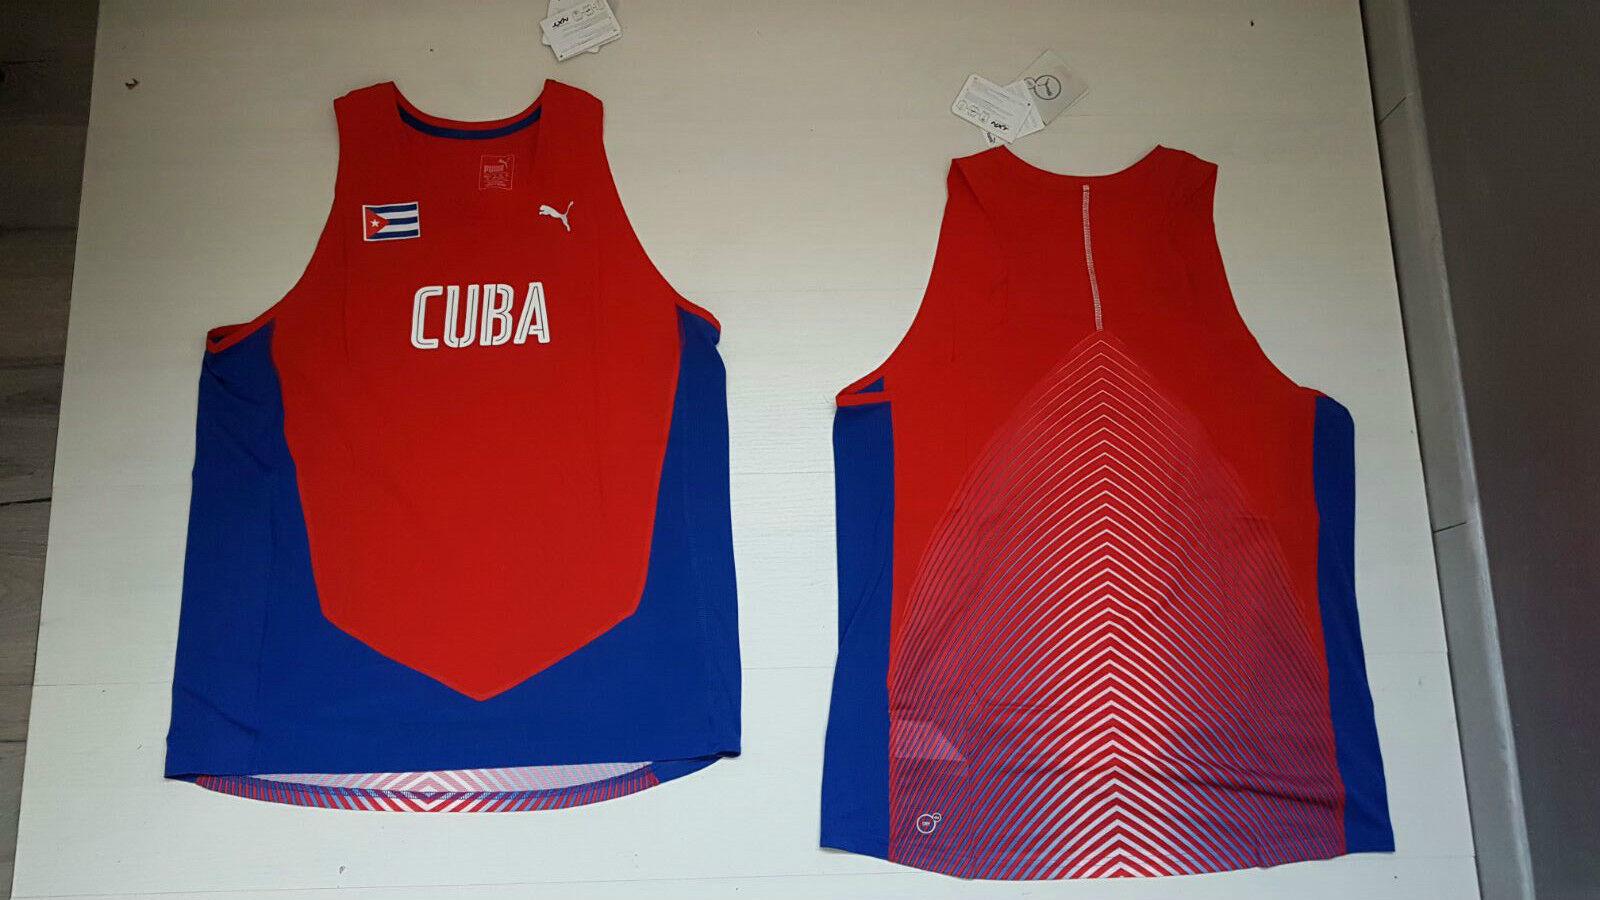 PUMA CUBA TANK TOP SINGLET TANK TOP SLEEVELESS RIO 2016 OLYMPICS SALSA